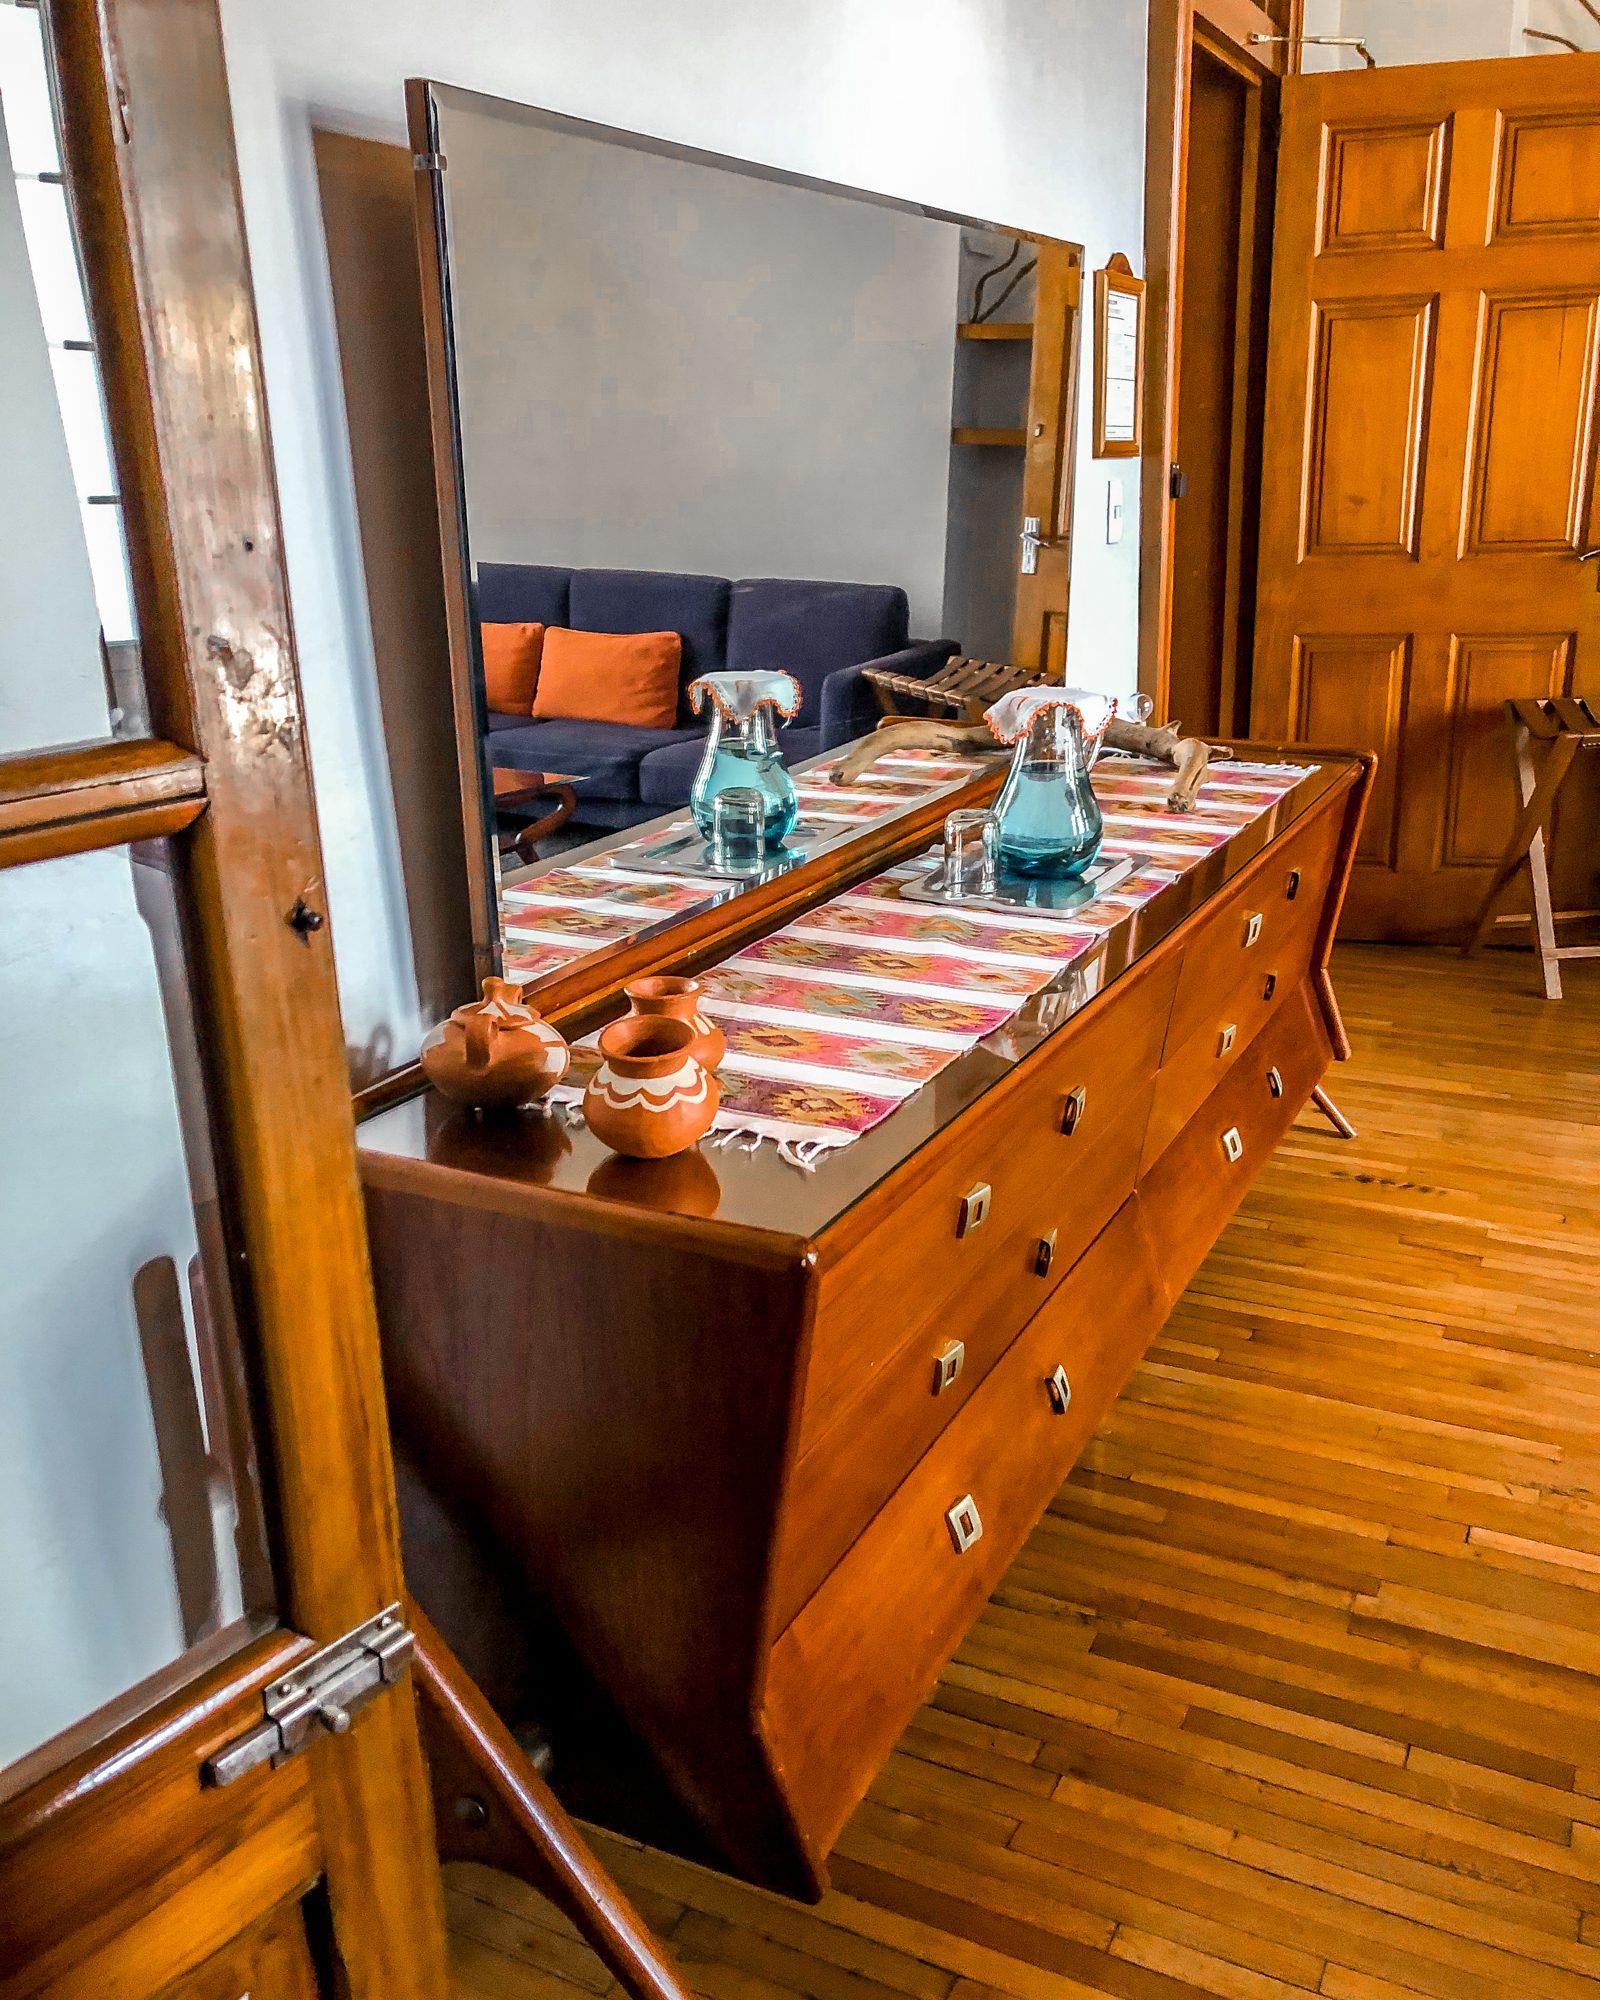 Chiapas suite historic hotel in Mexico City